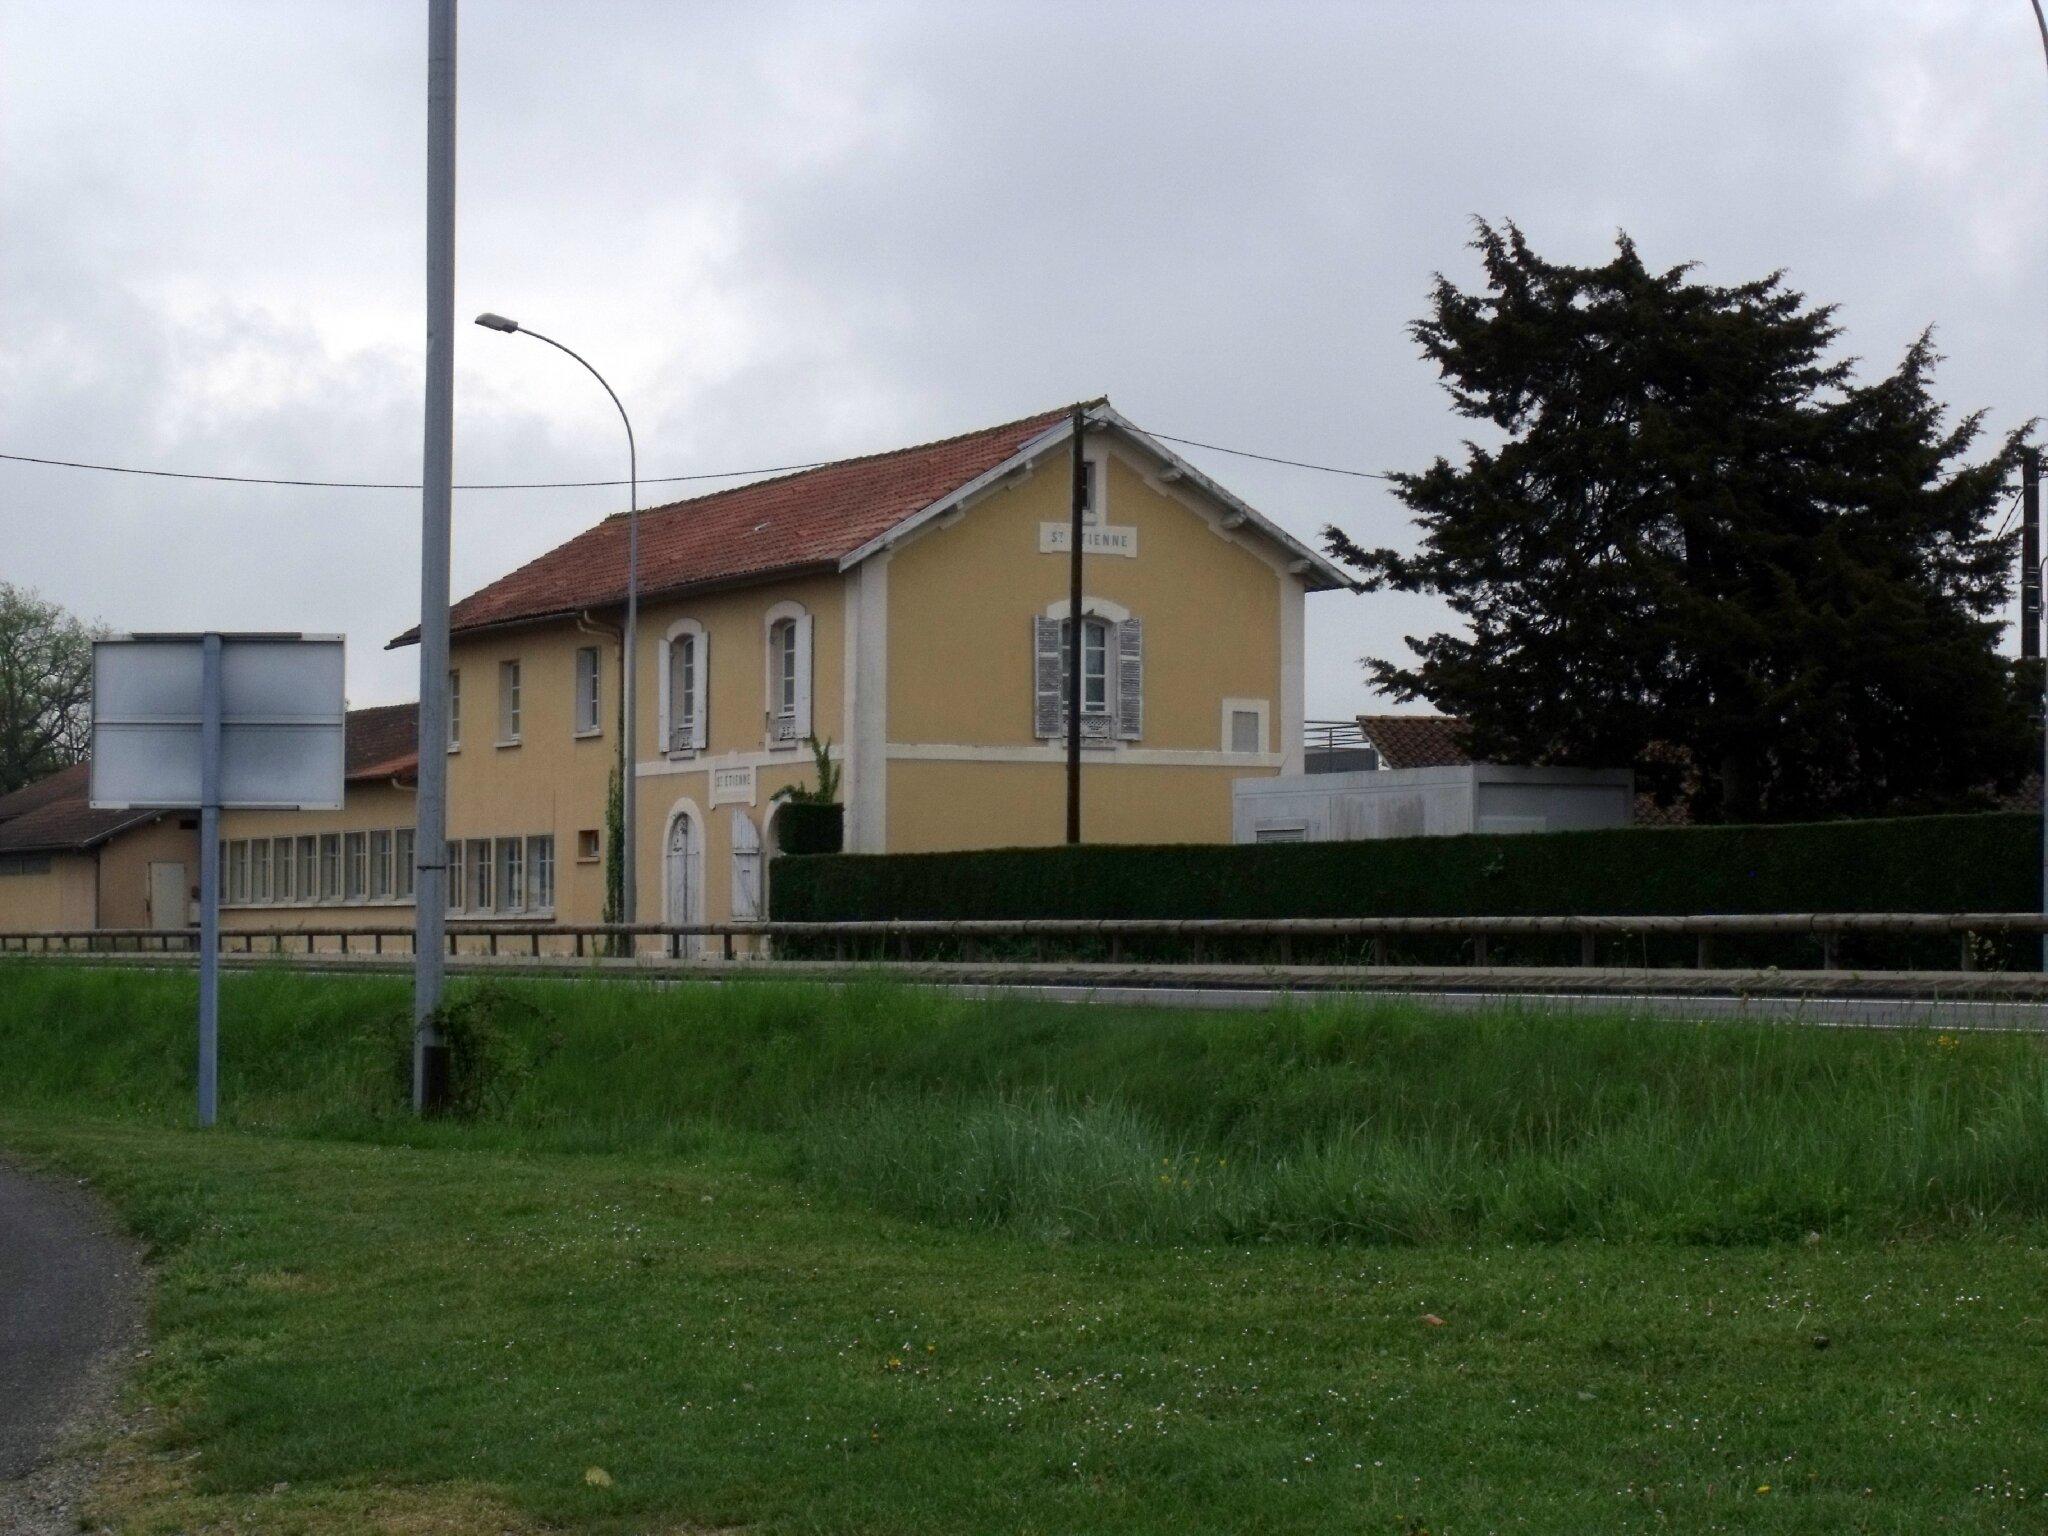 Saint-Étienne-de-Tulmont (Tarn-et-Garonne - 82)